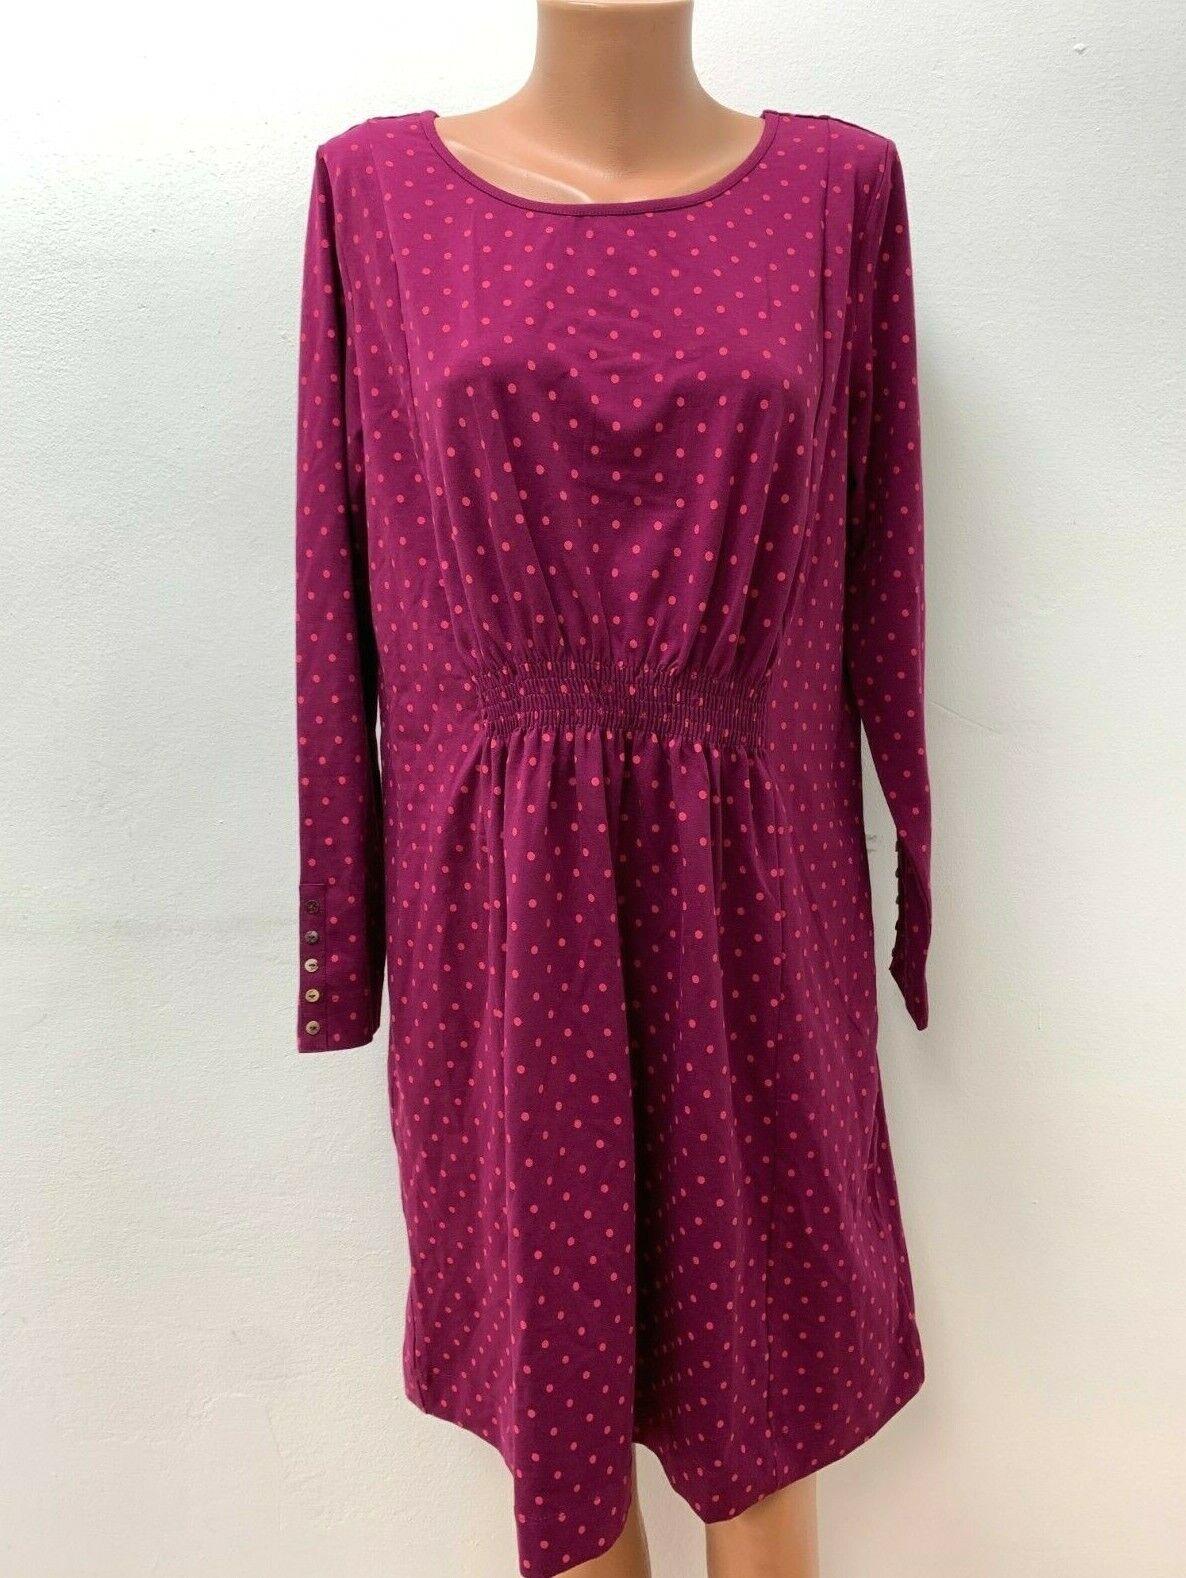 DEERBERG Gr.L / XL Stretch Kleid Jersey Rosa Magenta gepunktet Langarm